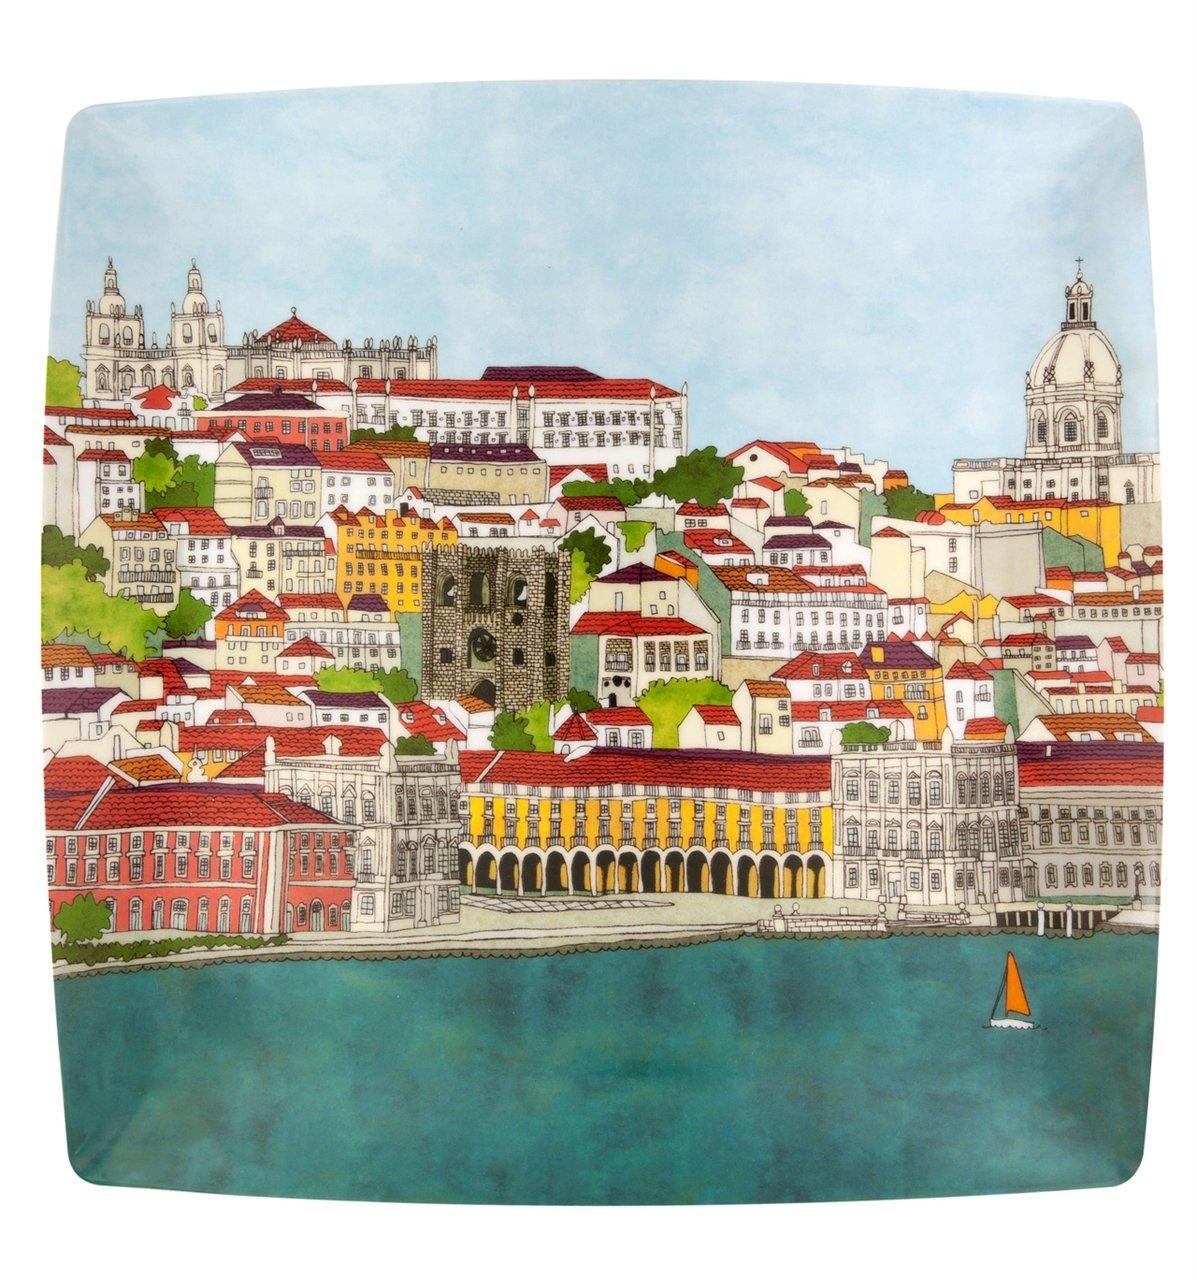 Vista Alegre Soul of Lisbon Porcelain Charger Plate Made in Portugal